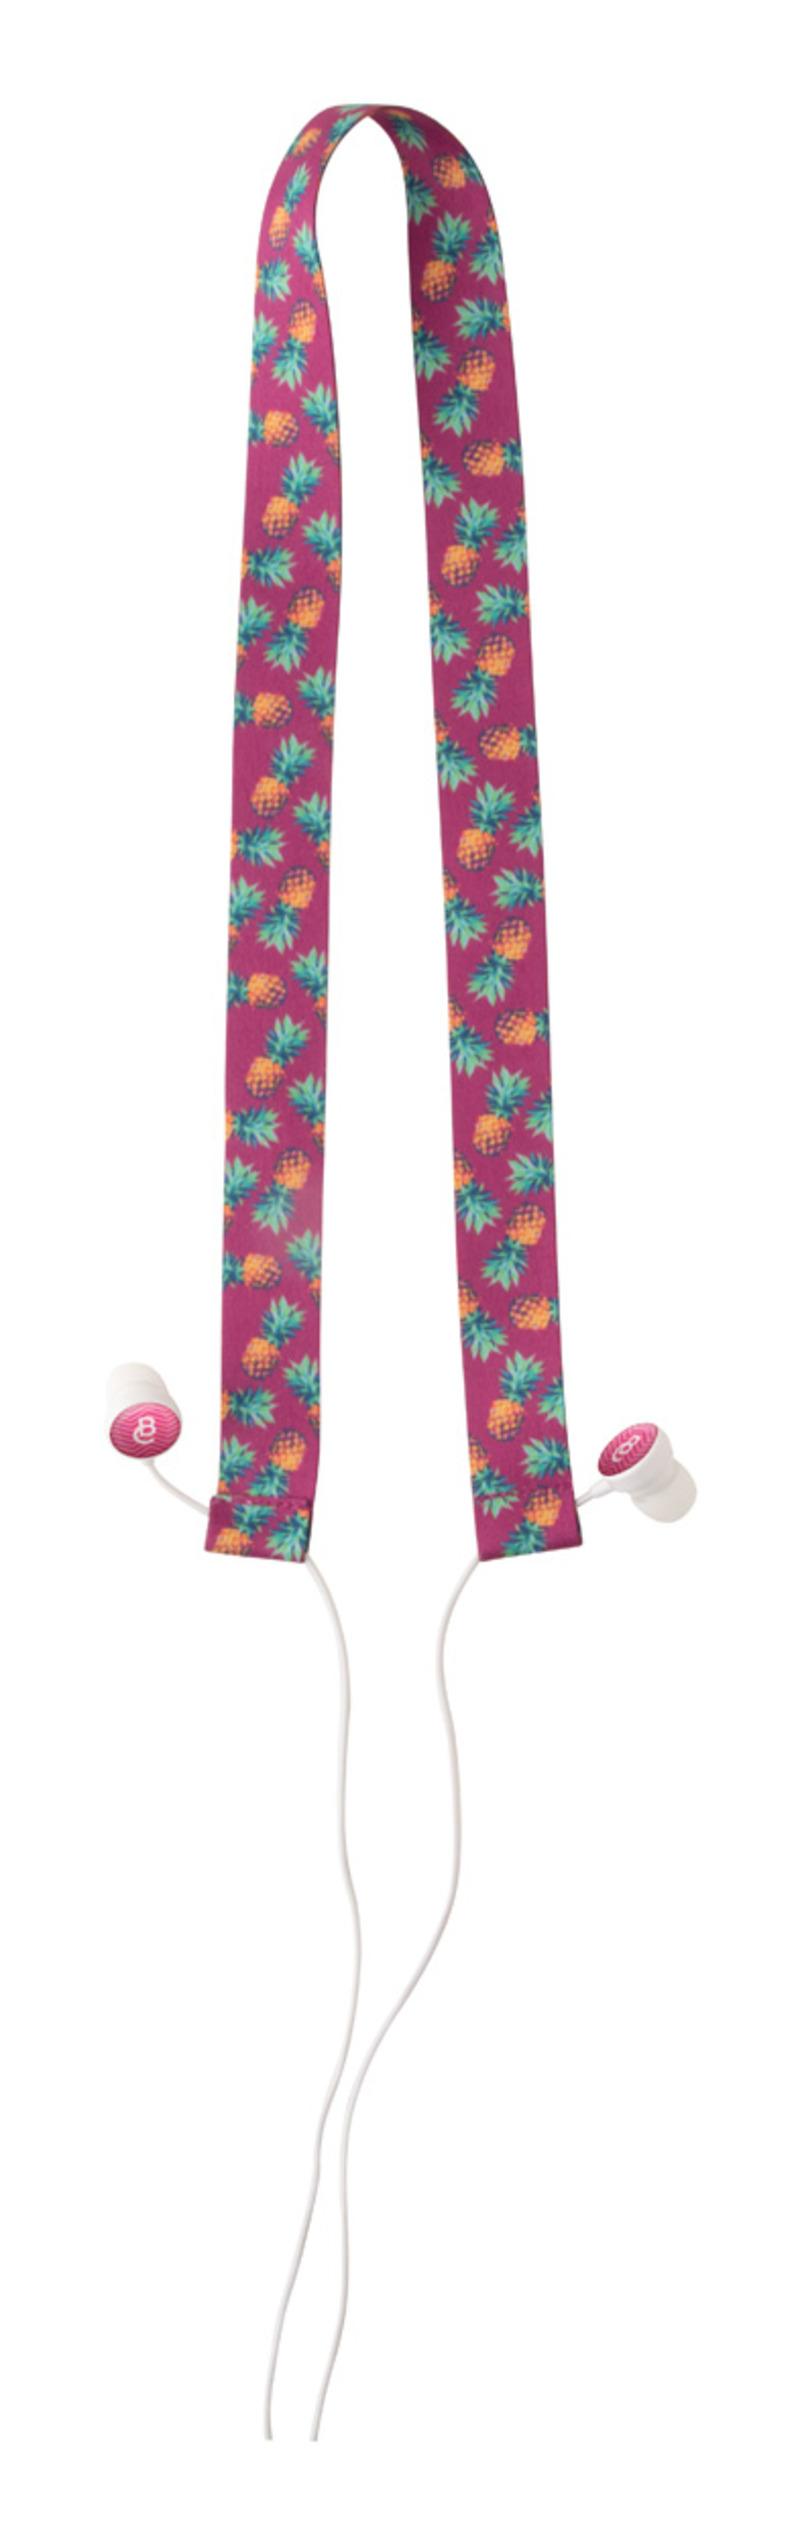 Subobass earphones lanyard